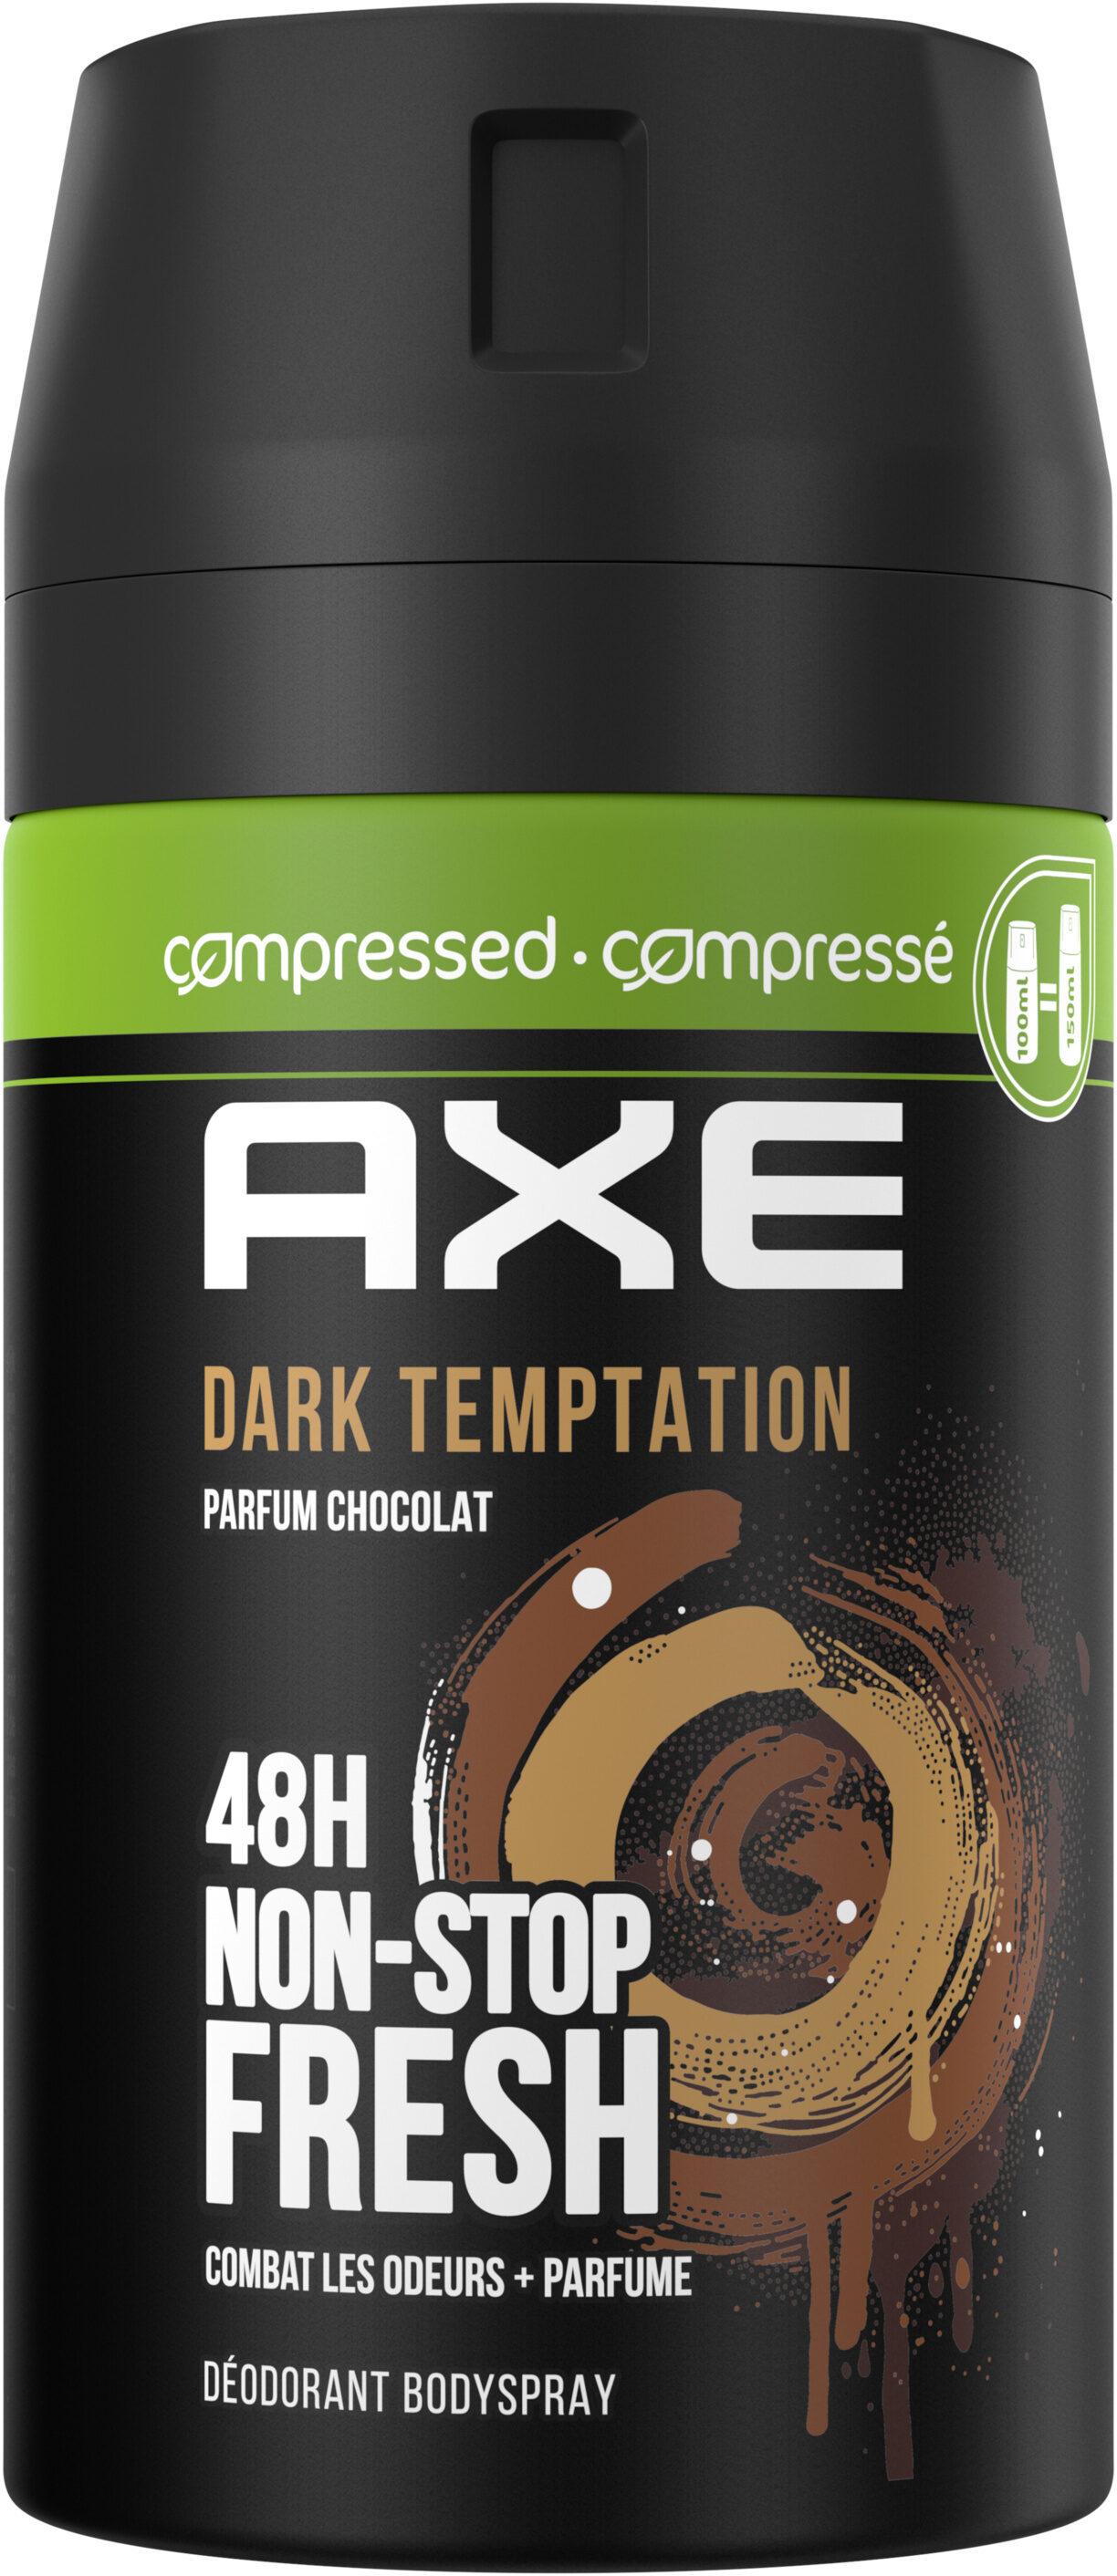 AXE Déodorant Homme Bodyspray Compressé Dark Temptation 48hFrais - Product - fr